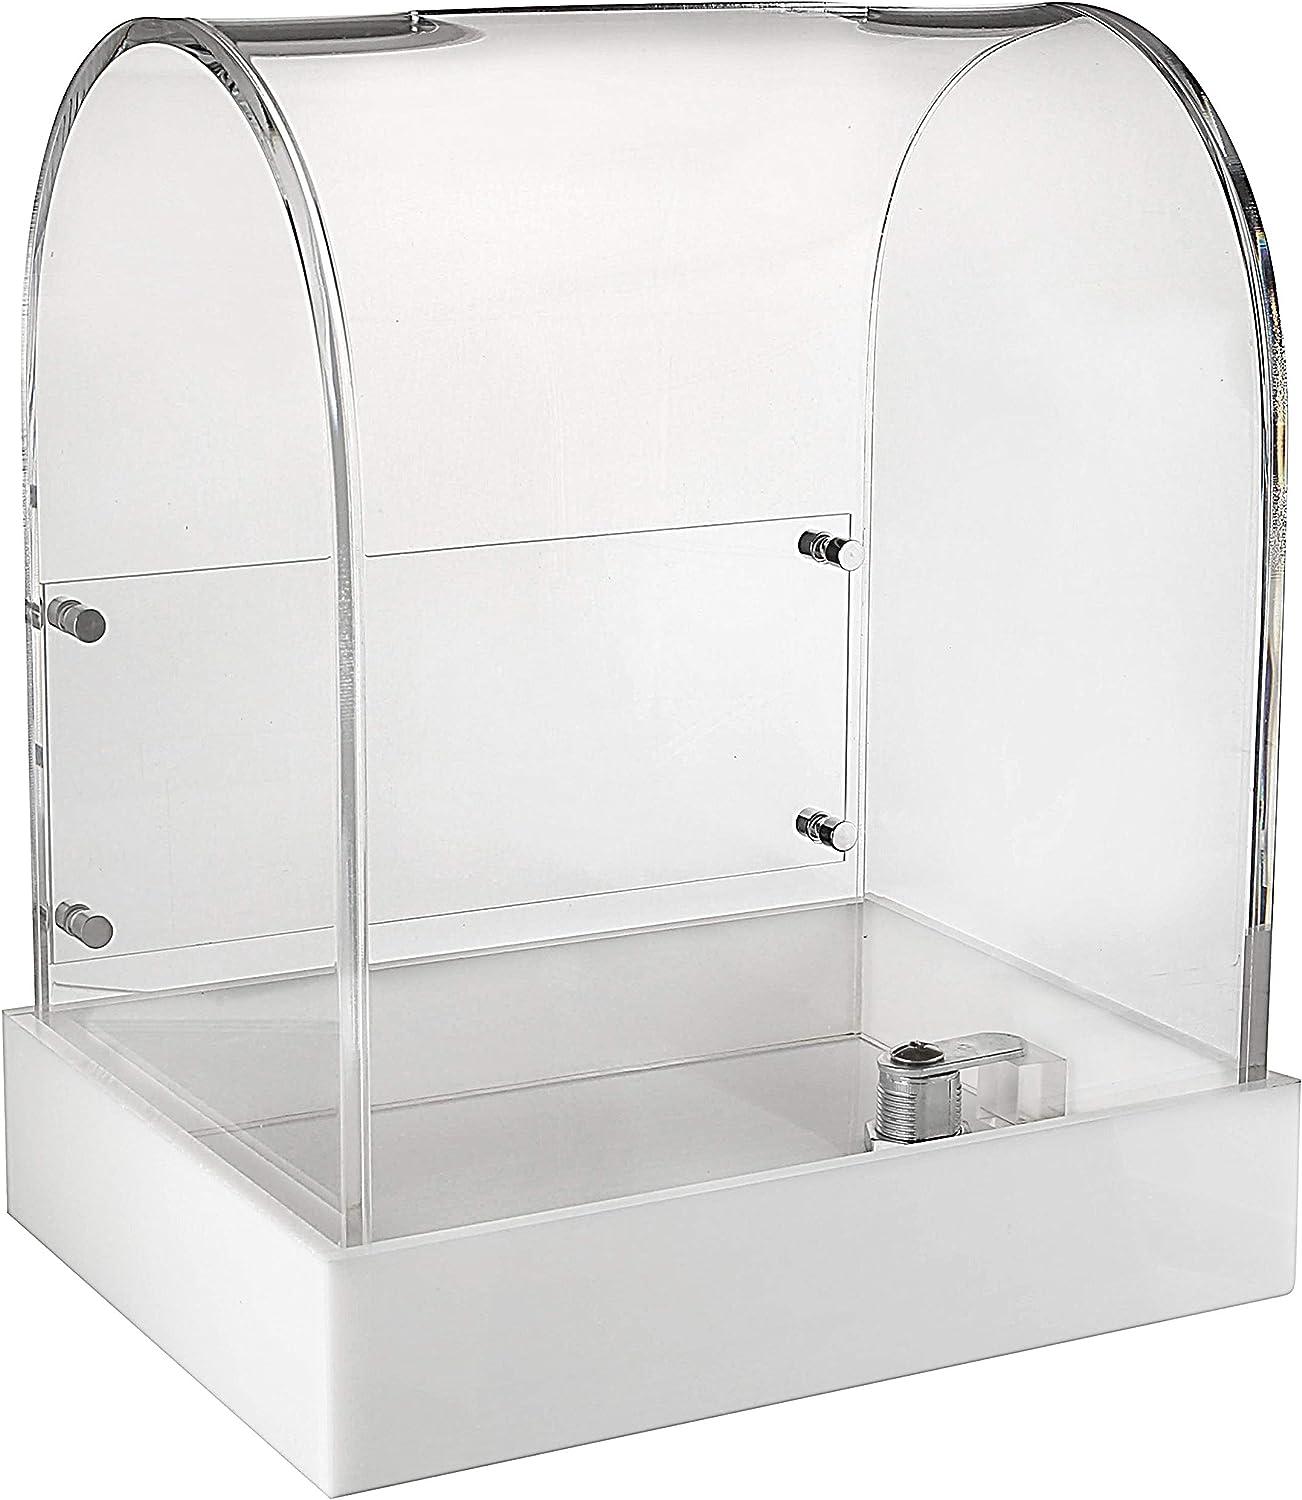 MCB Premium shop Modern Design Acrylic Max 45% OFF Fundr Donations for Box Ballot